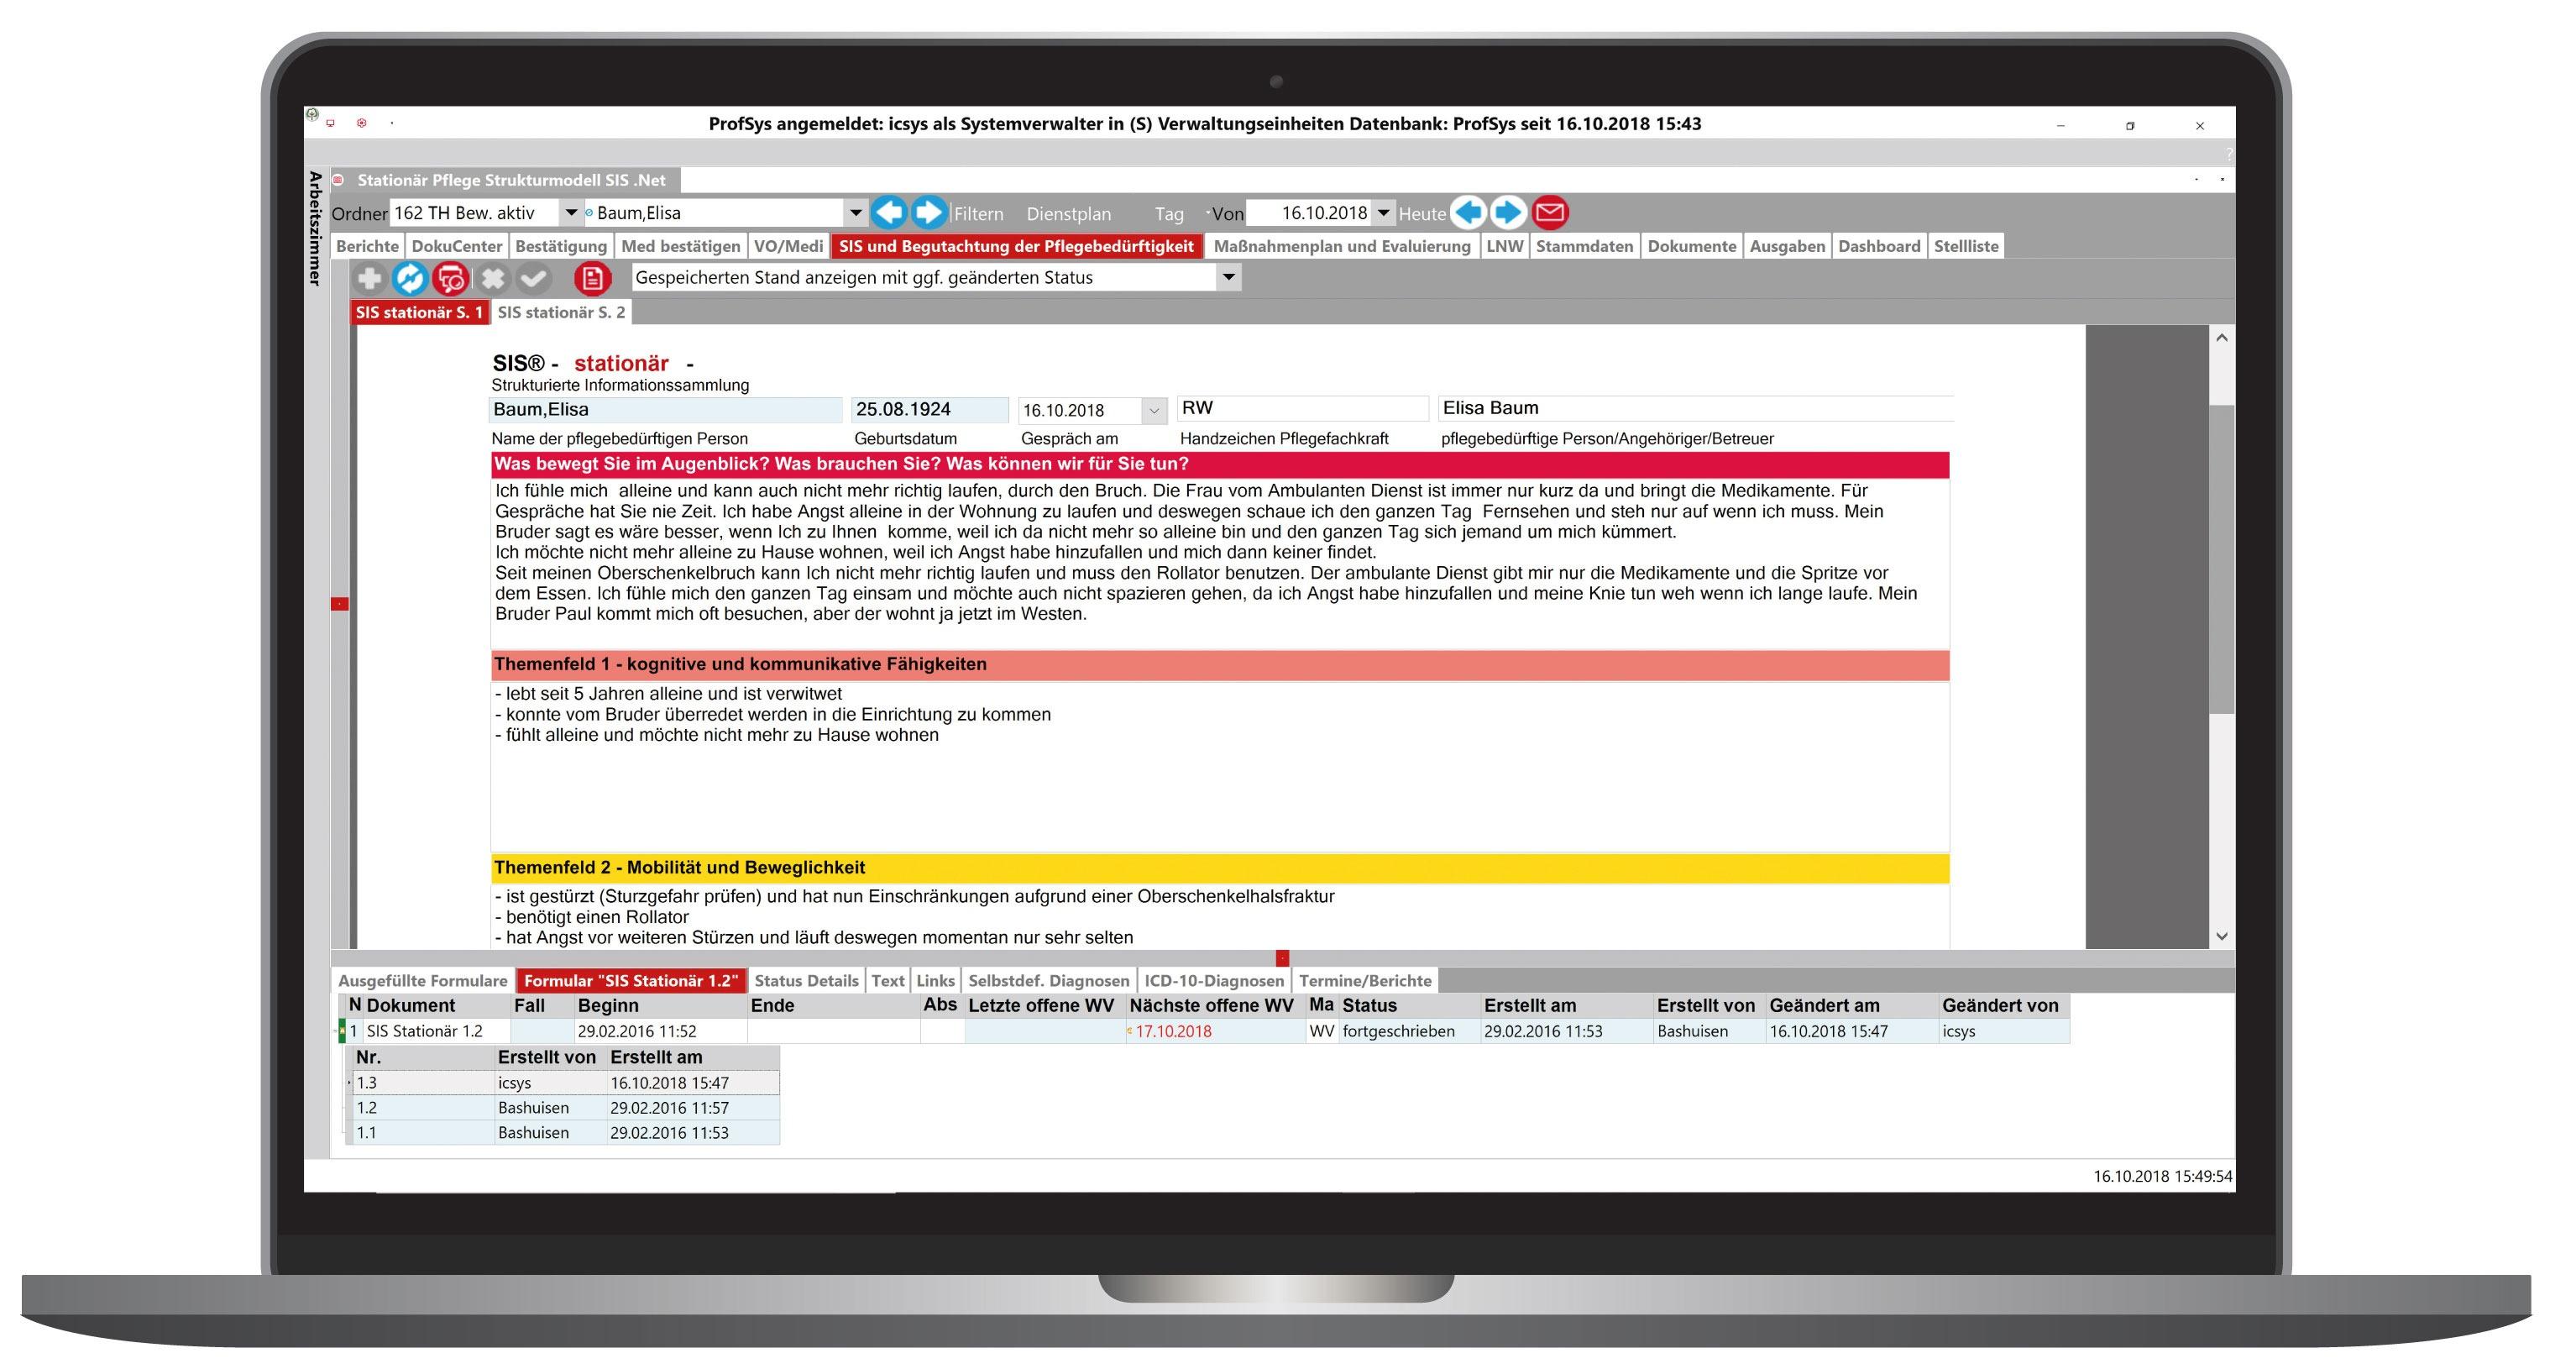 profsys_altenhilfe_stationaer_planung_und_dokumentation